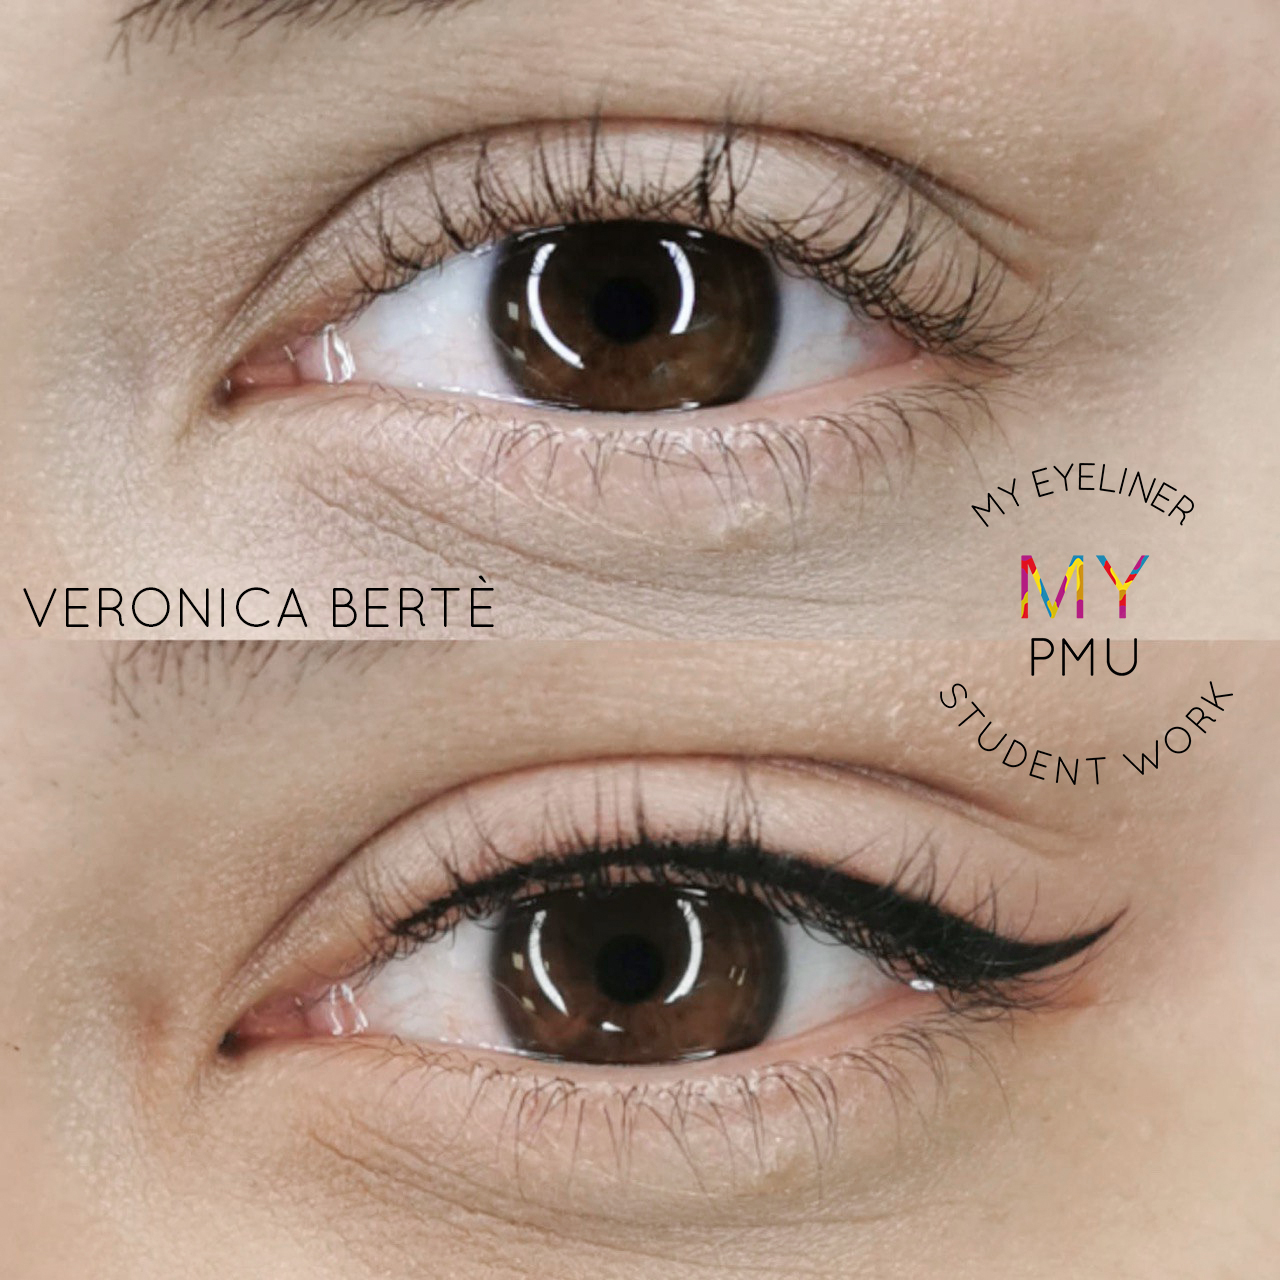 Lavoro allieve my eyeliner Bertè Veronica (2)